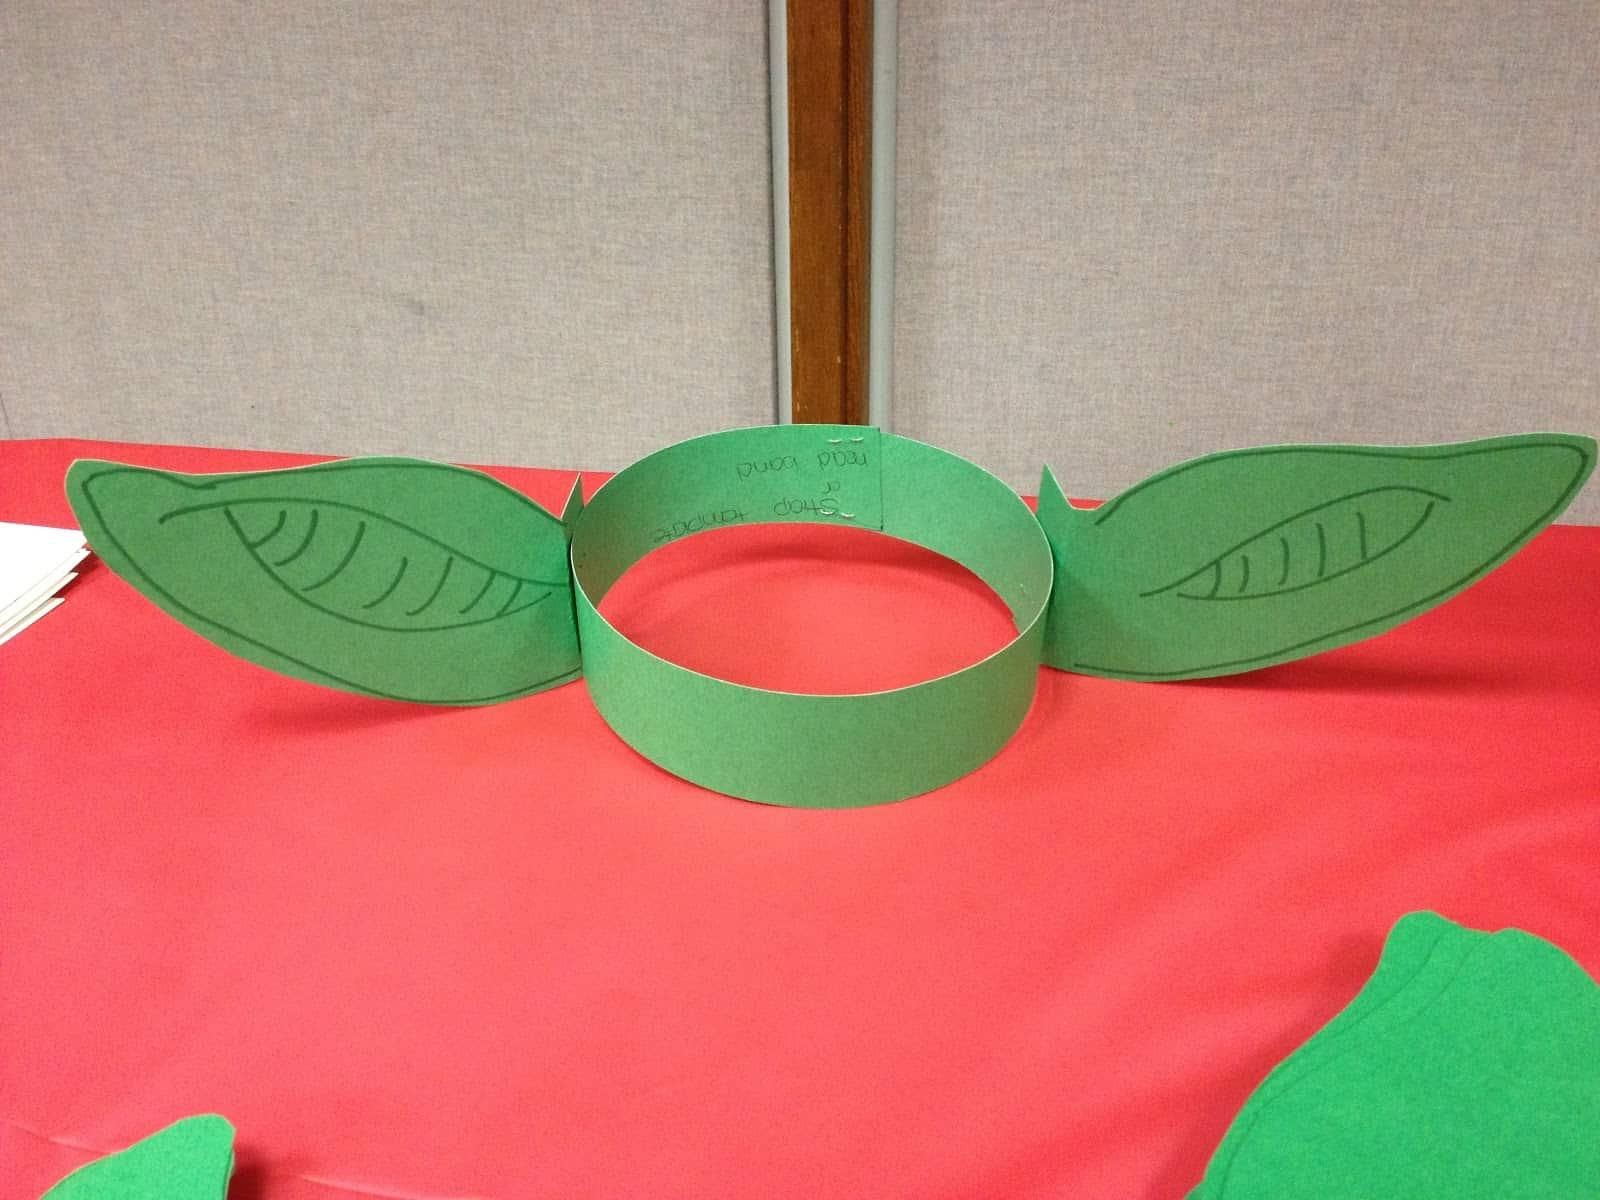 Construction paper yoda ears